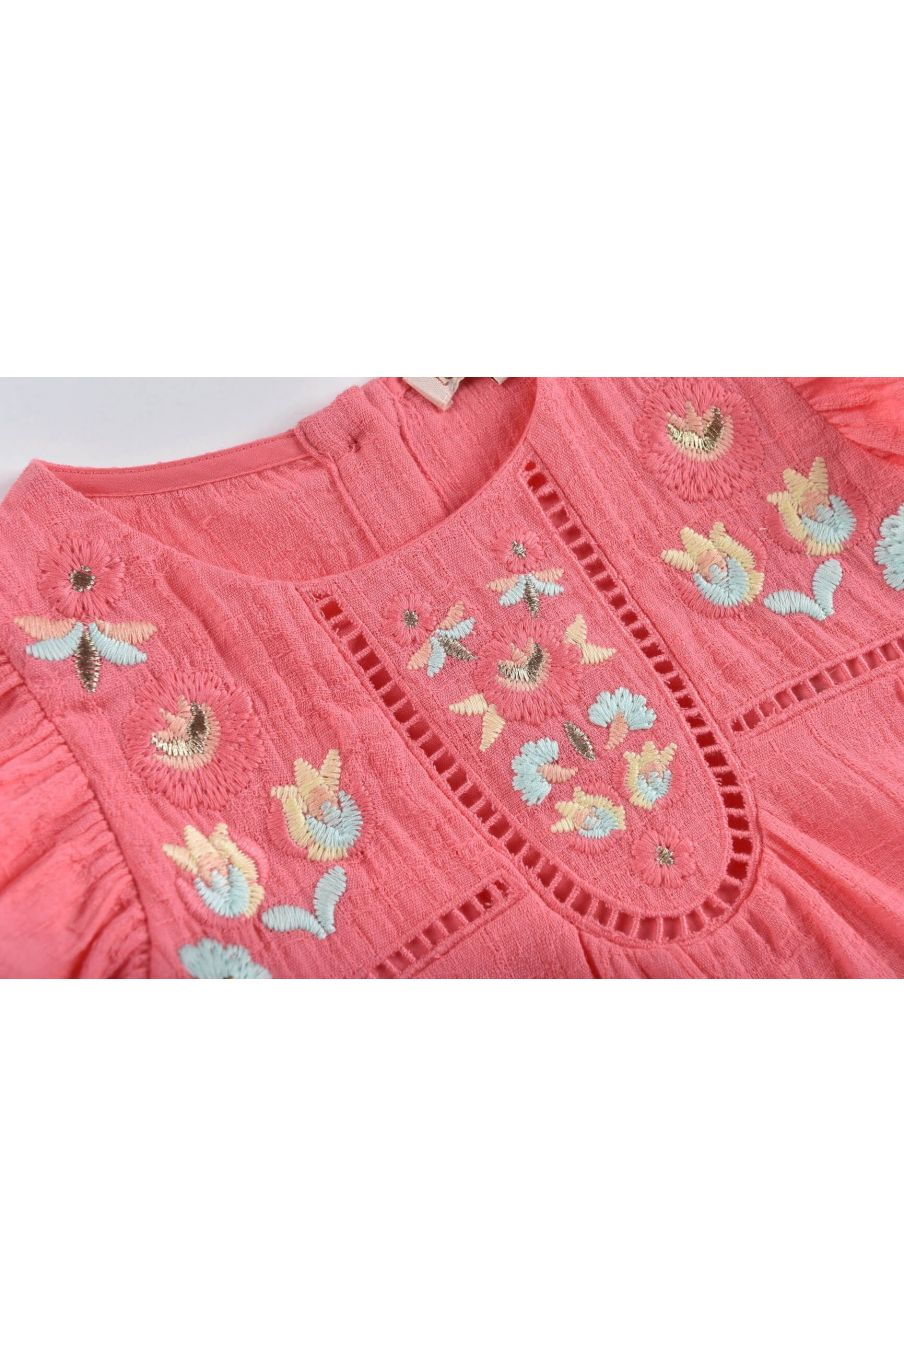 boheme chic vintage blouse fille carmen framboise